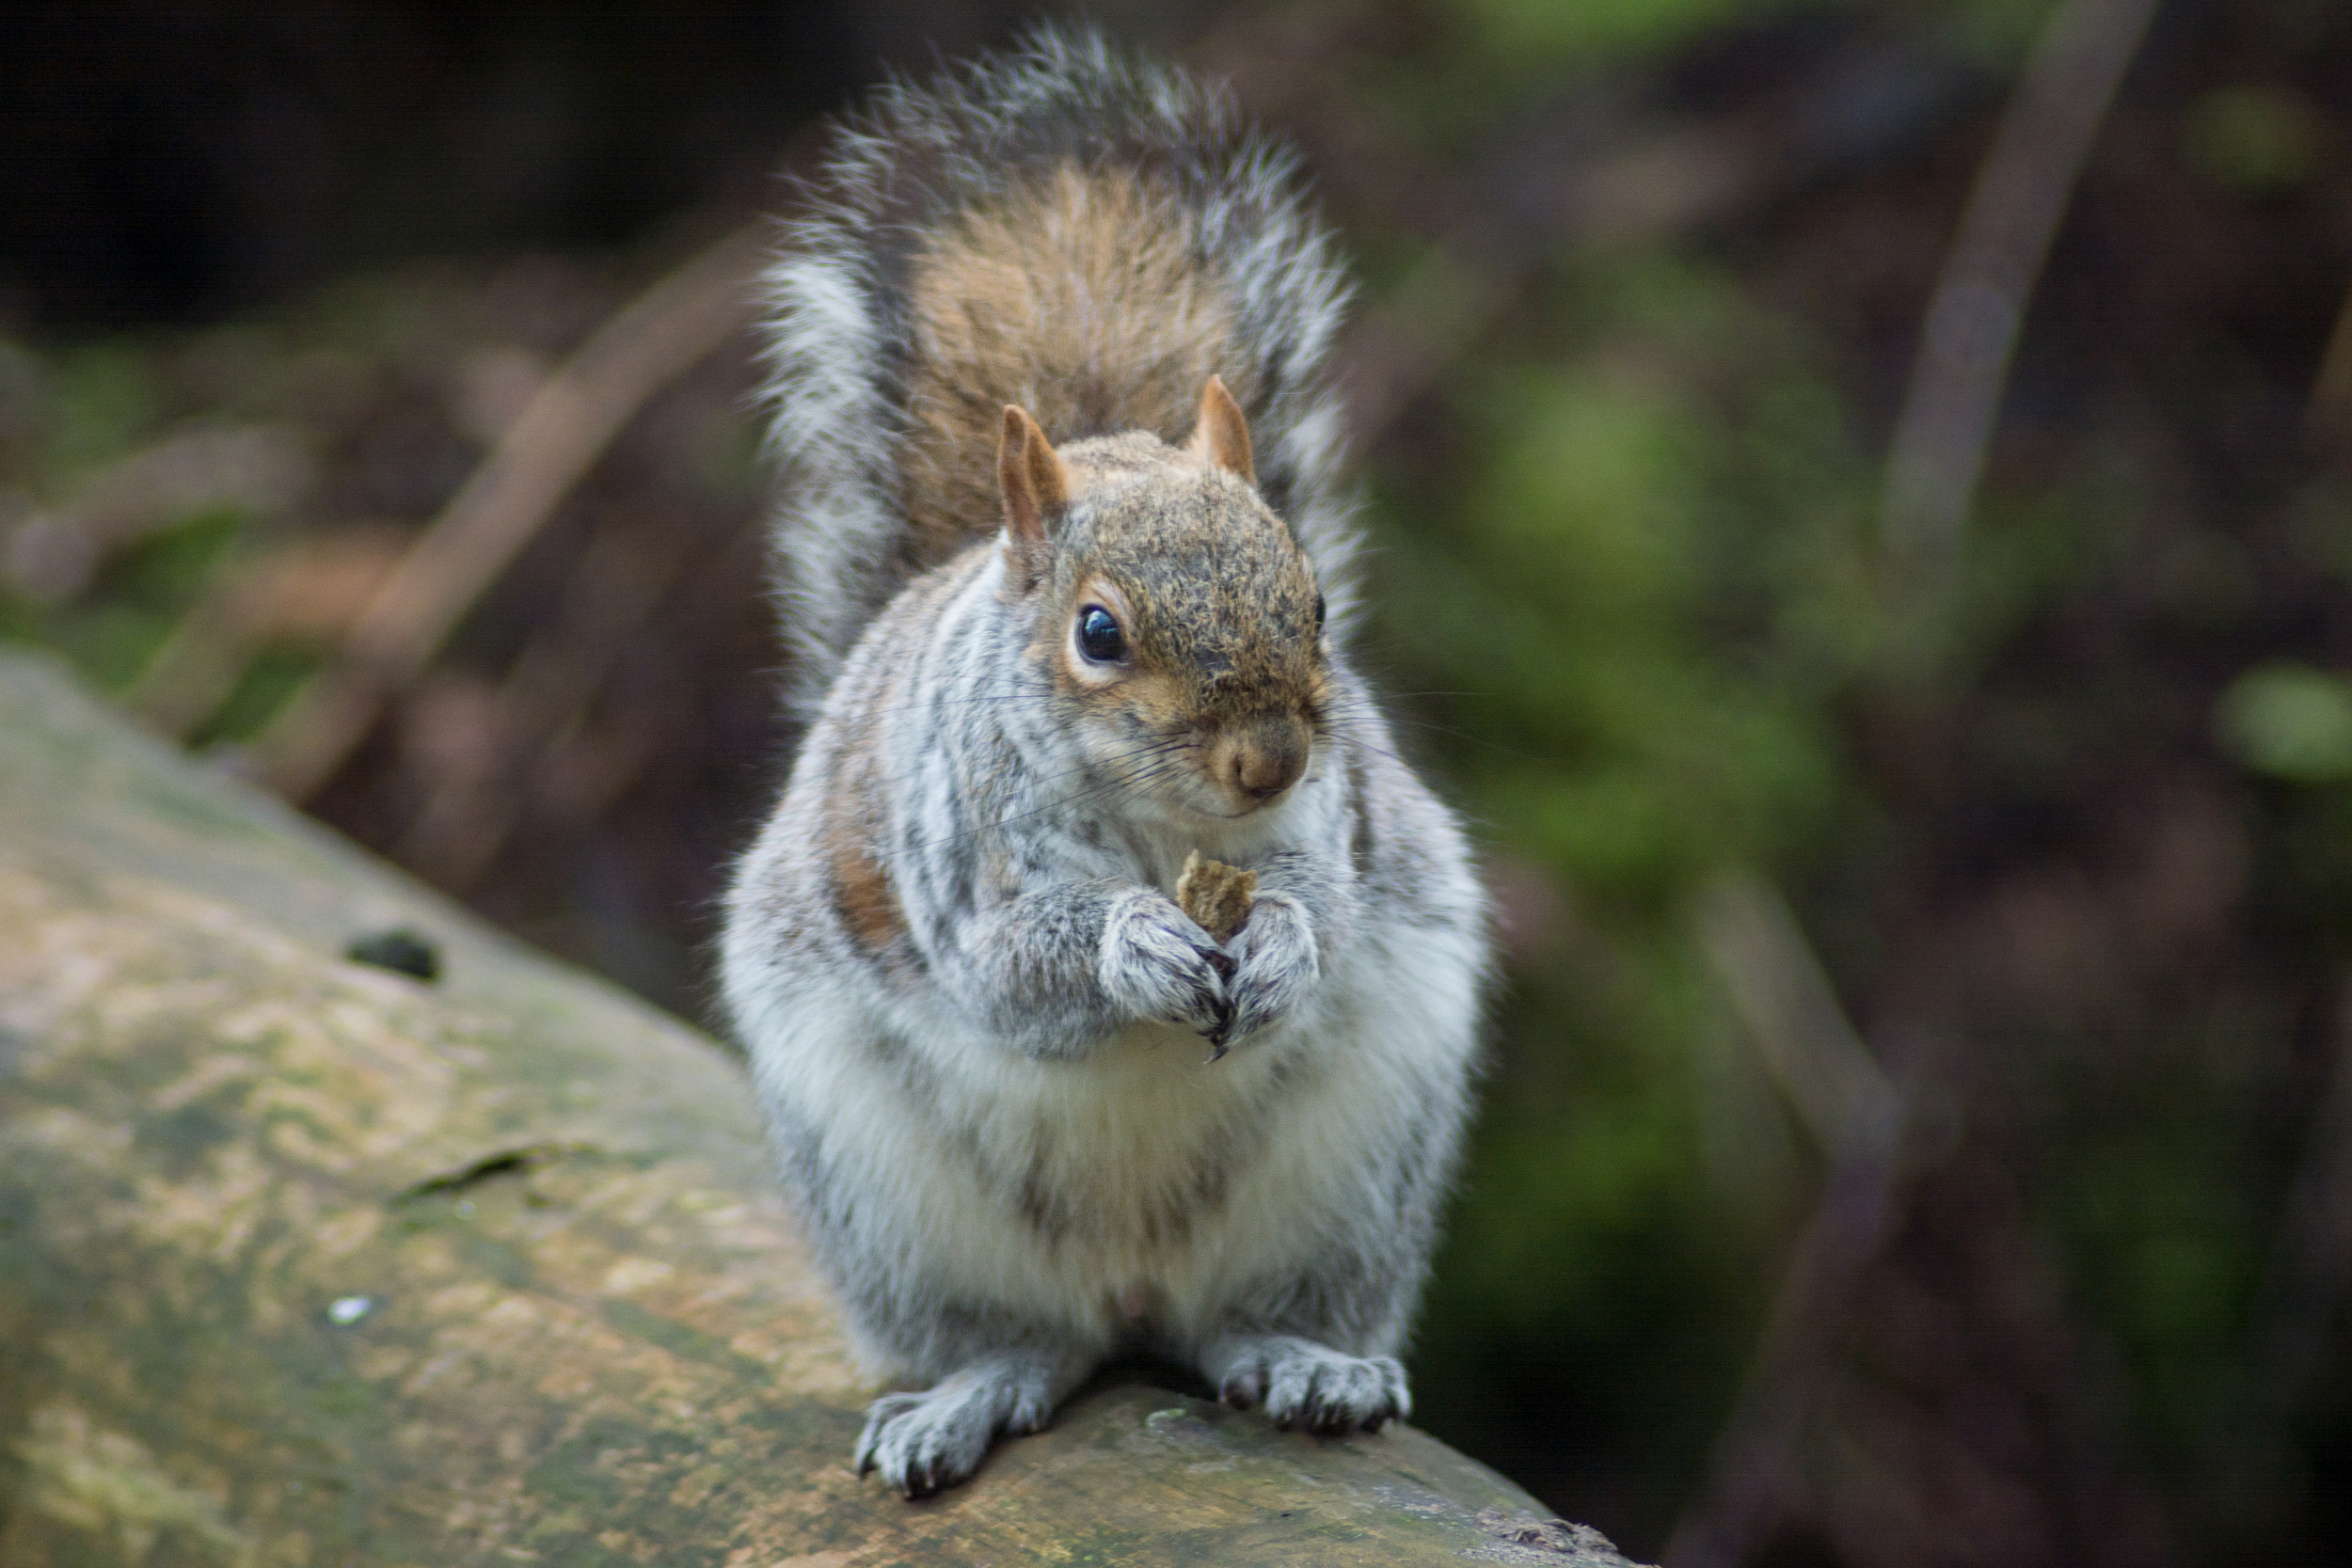 Squirrel Edinburgh Zoo - Sat 7 March 2015 -2997.jpg